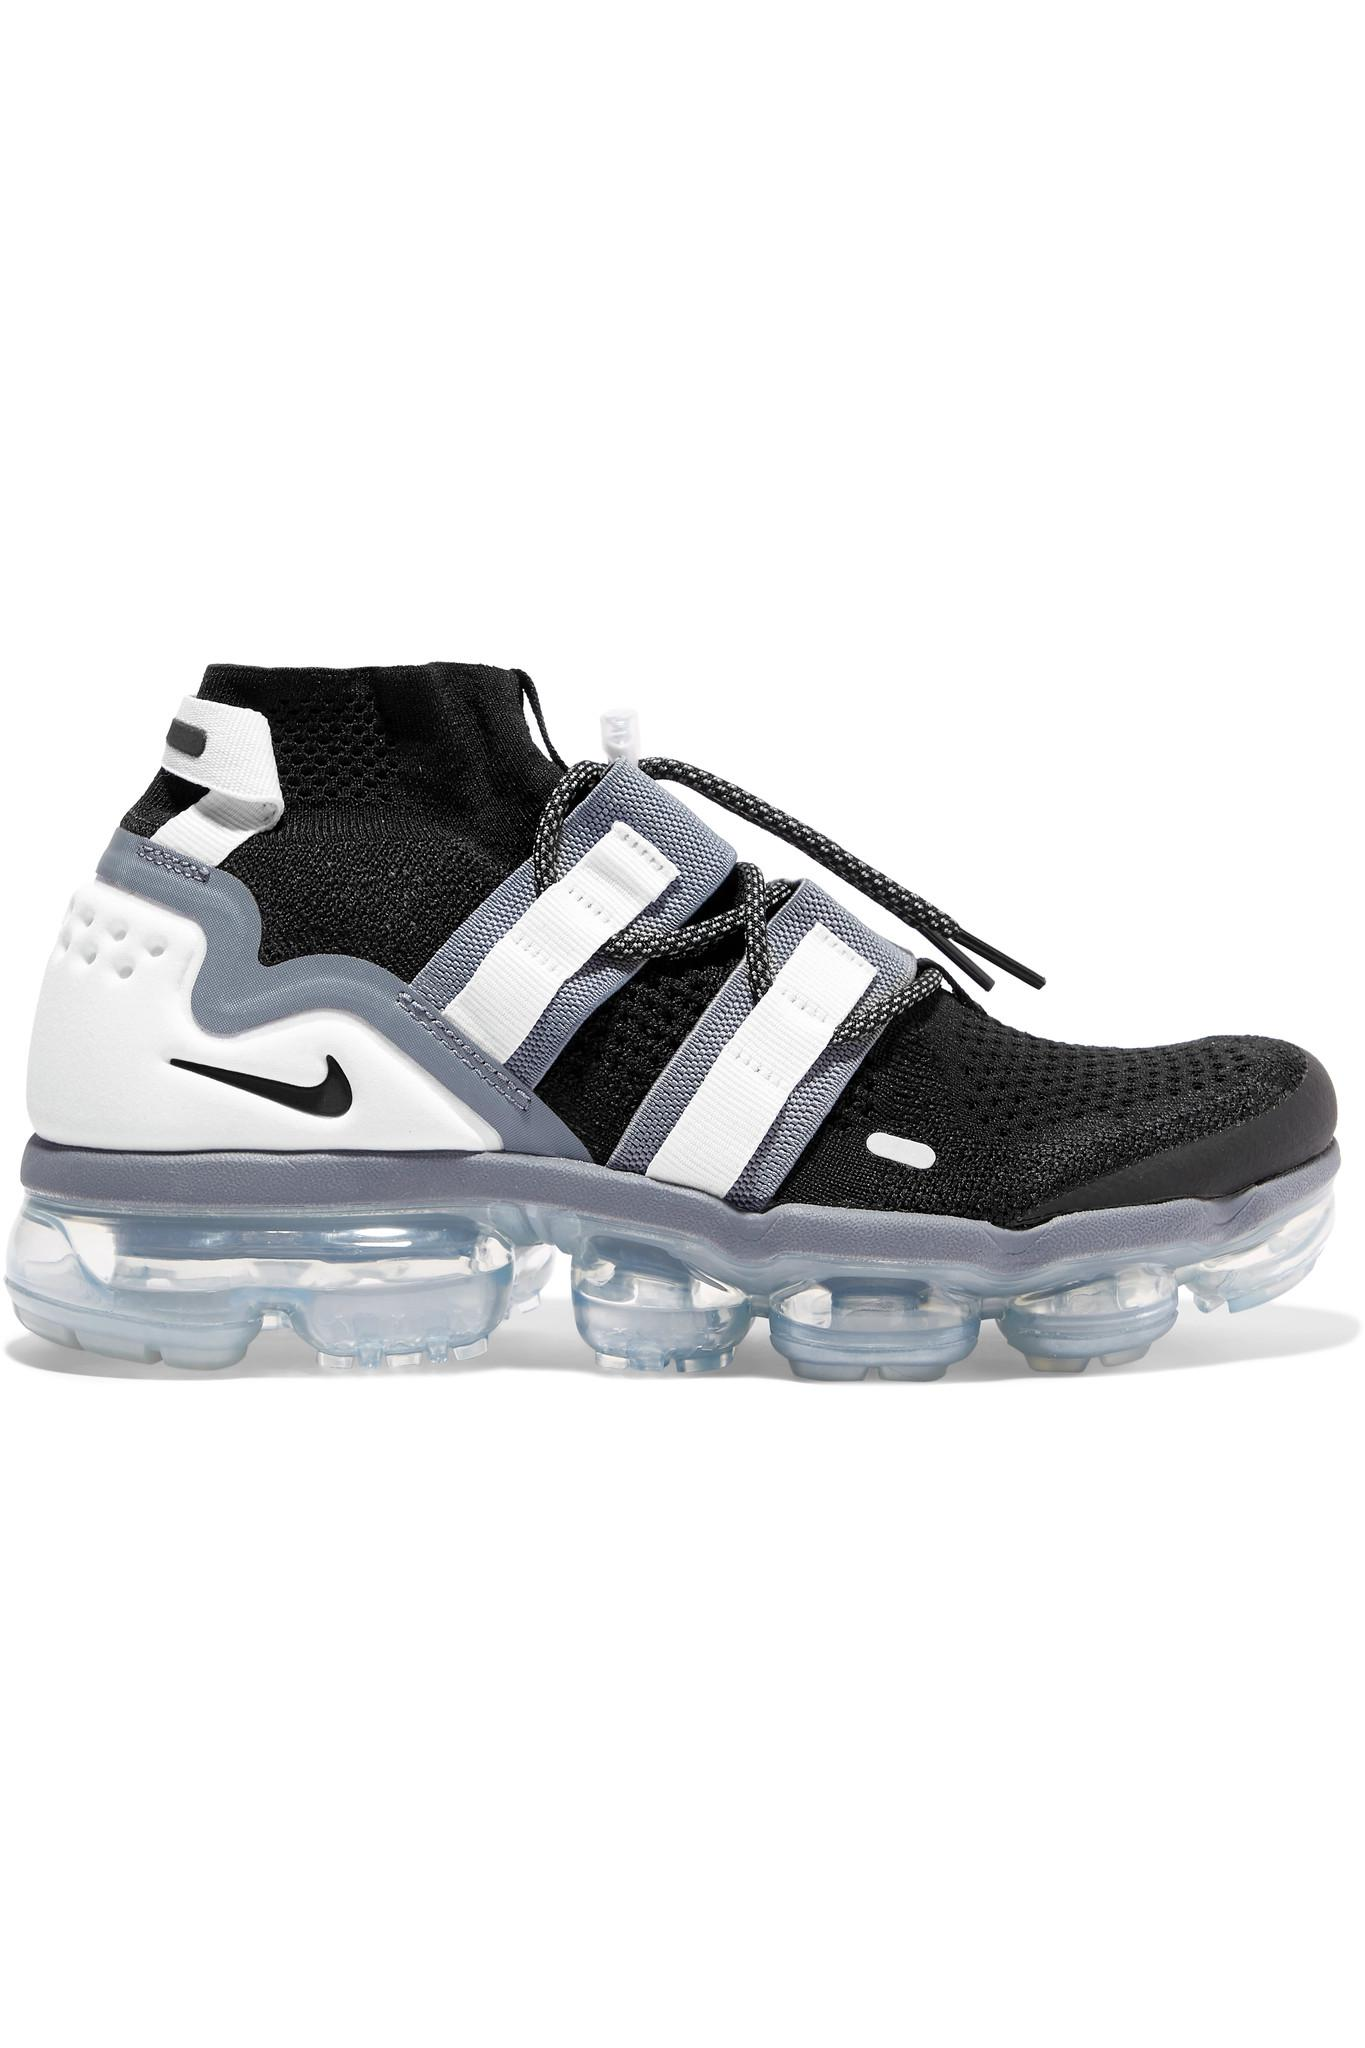 e3cc11e7c941 Nike Air Vapormax Flyknit Utility Sneakers in Black - Lyst